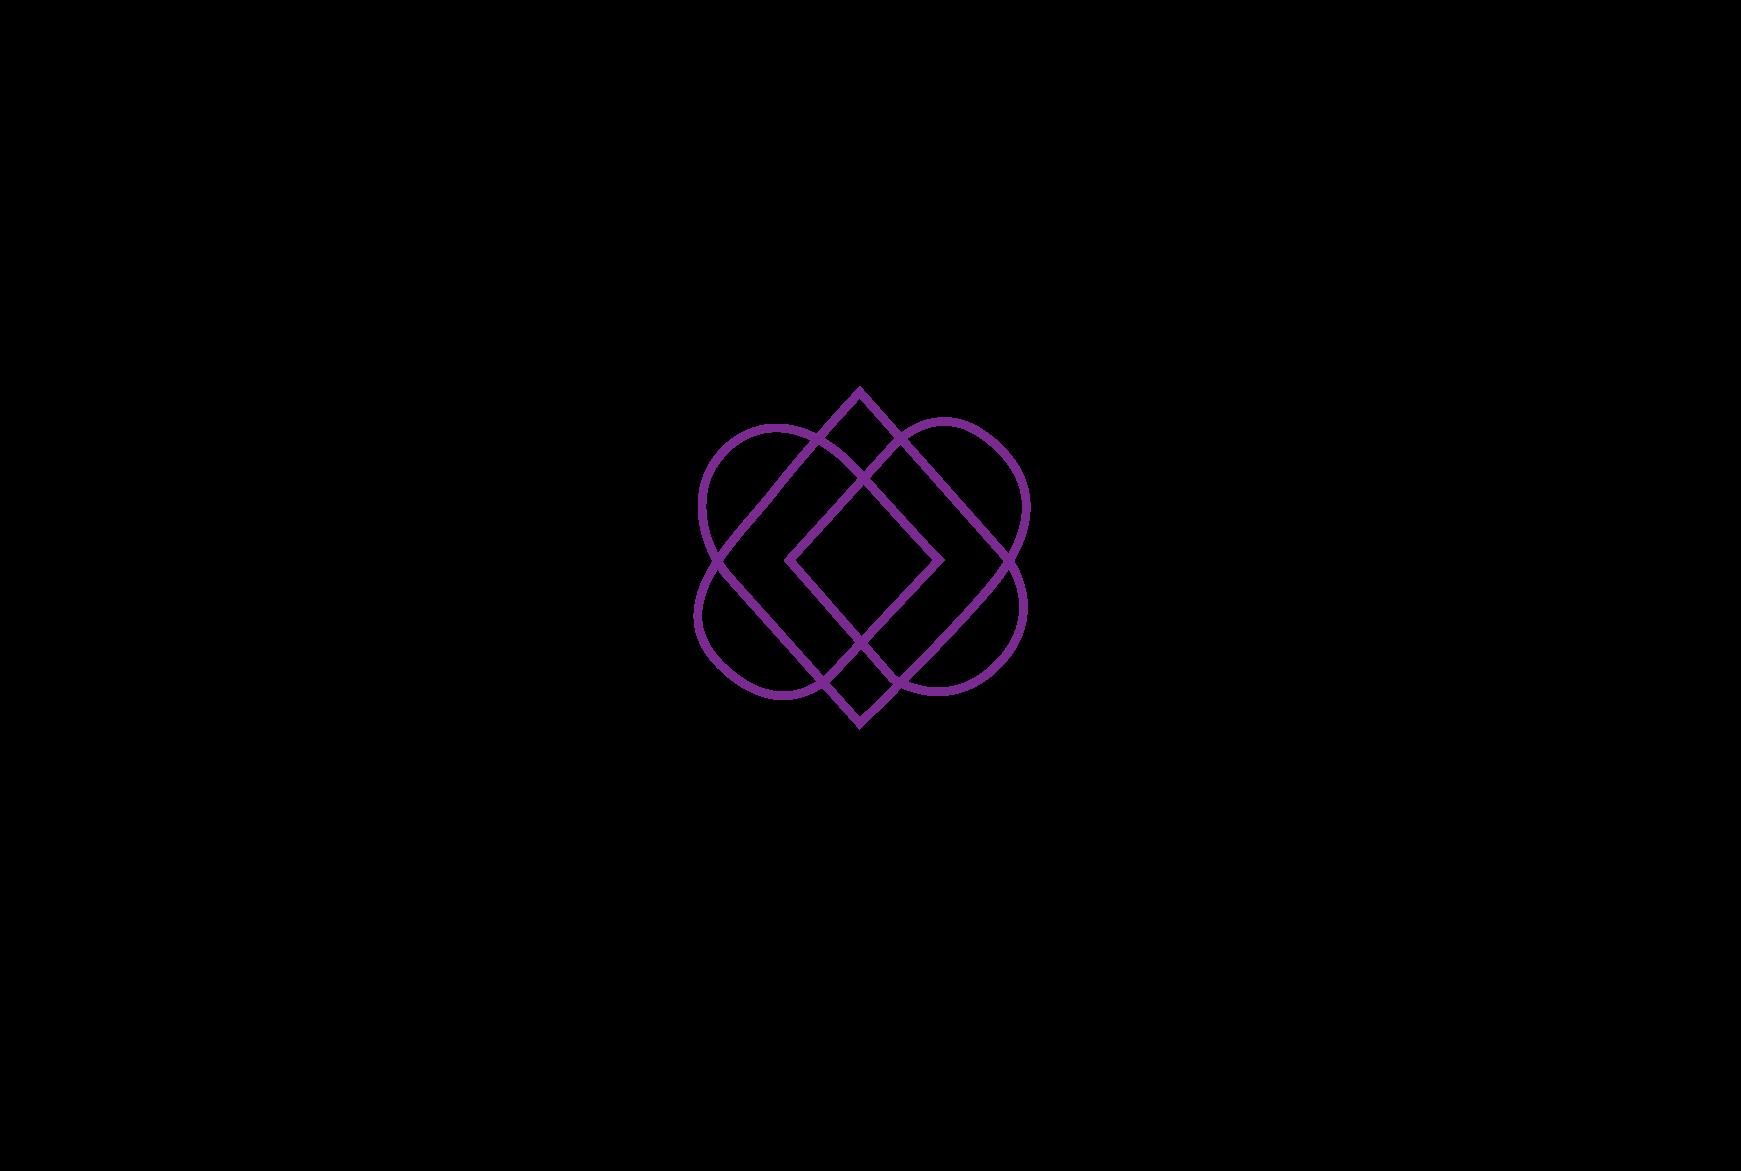 Deva_Corp-forme-violette-1503584034.png